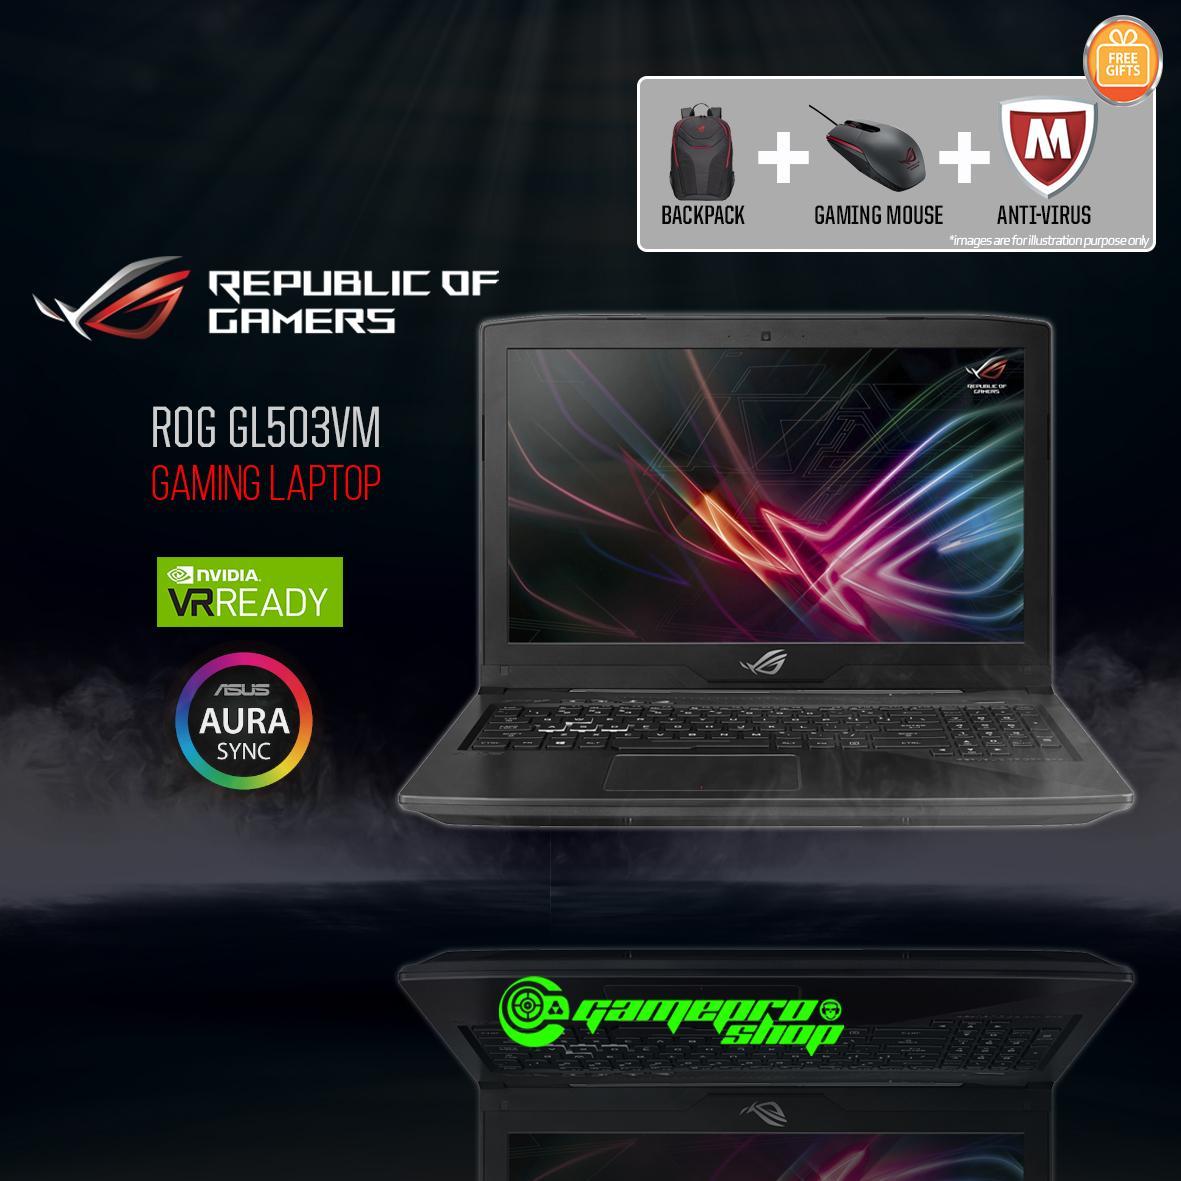 ASUS ROG Strix GL503VM – FY359T (i7-7700HQ/ GTX1060 6GB/ 128GB SSD+ 1TB HDD) 15.6 FHD *THE TECH SHOW PROMO*